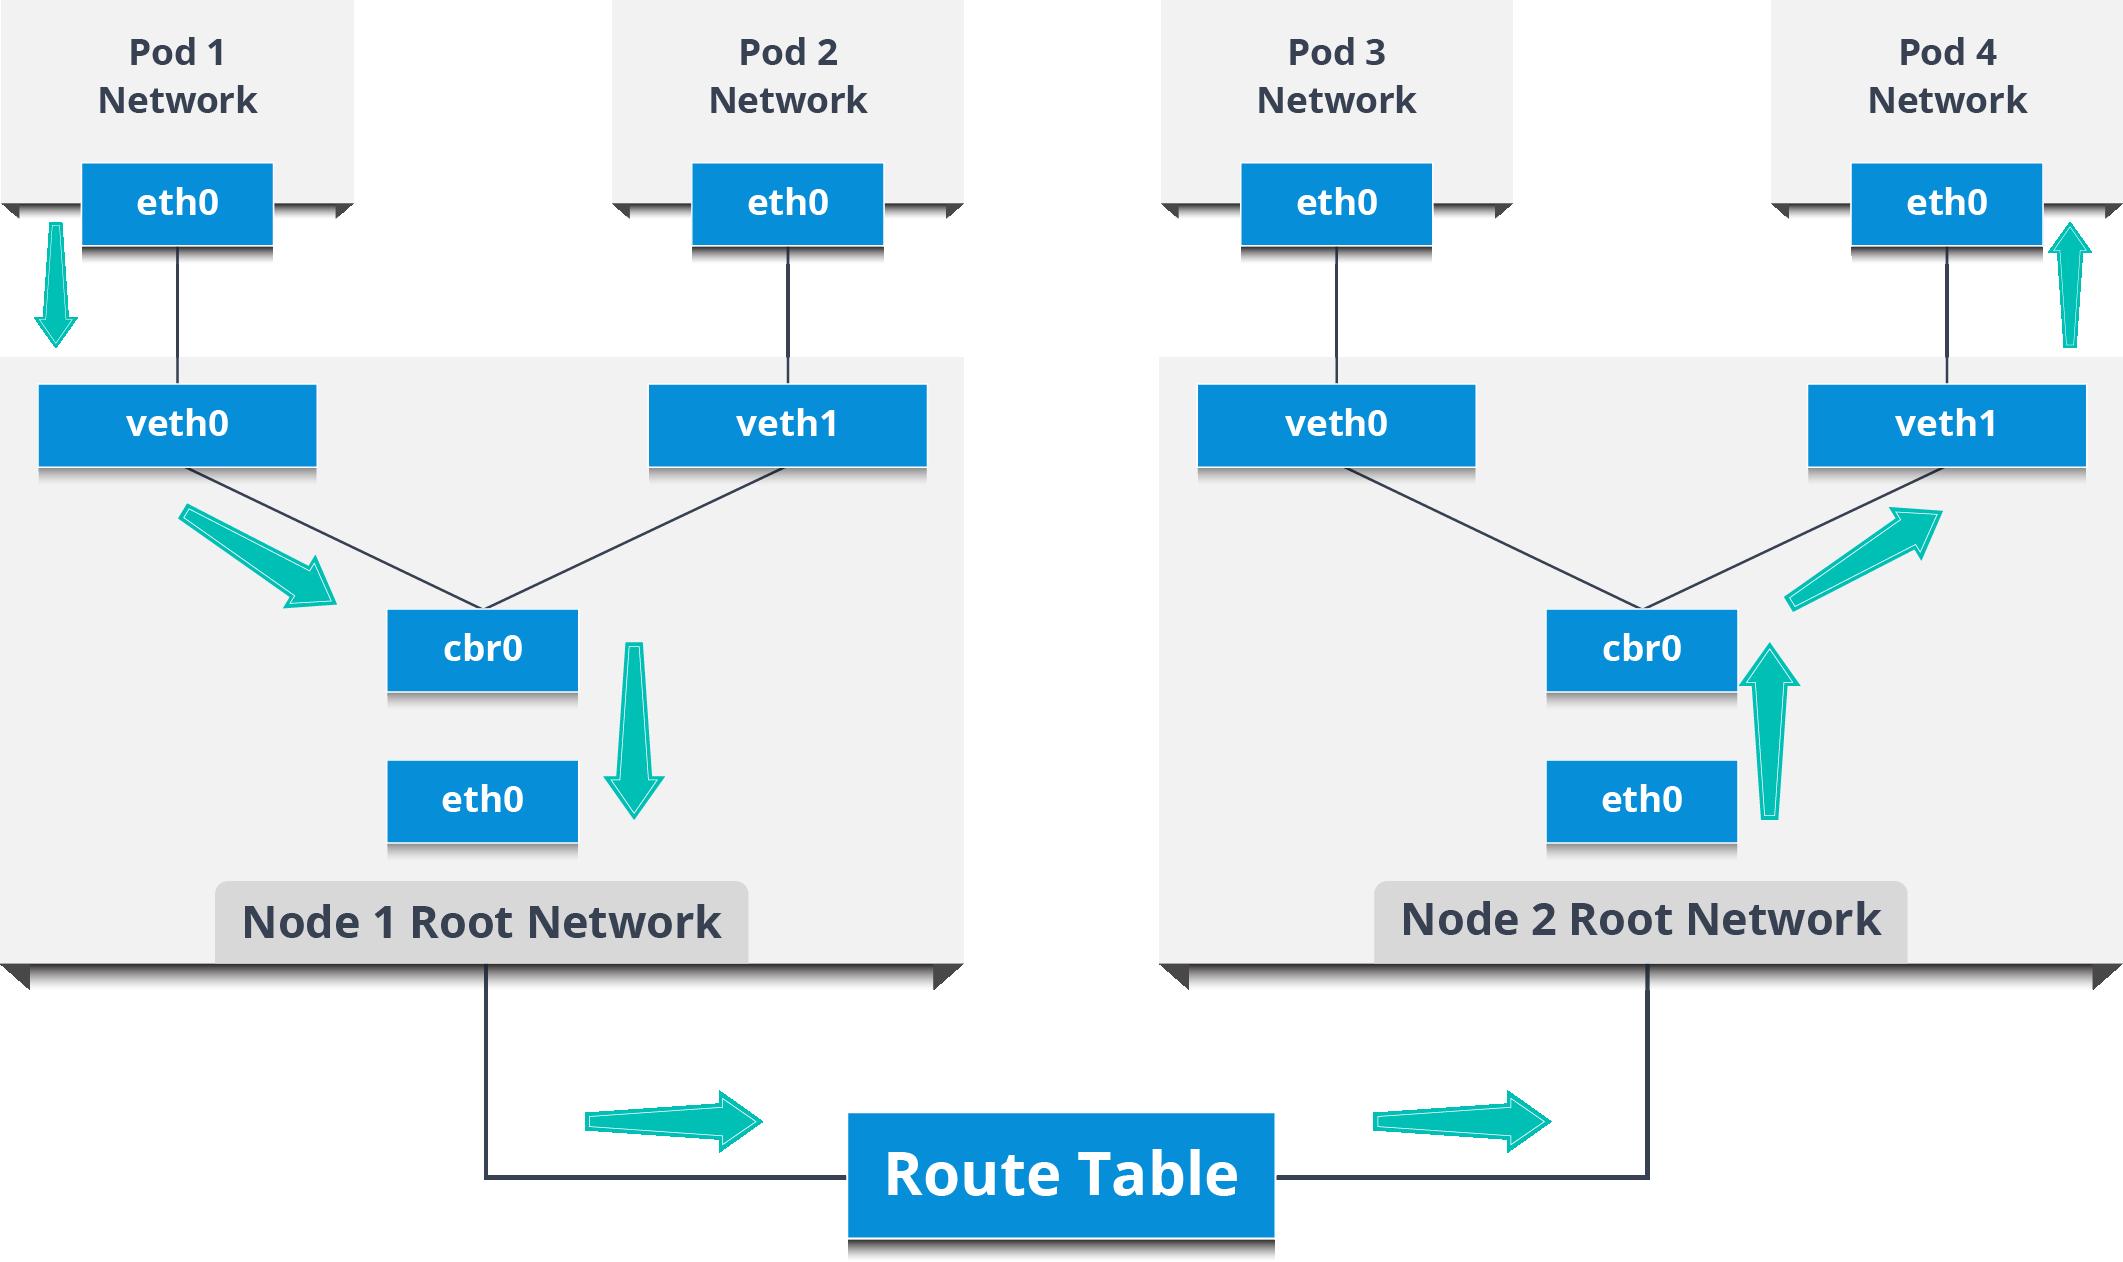 Inter Node Pod Network - Kubernetes Networking - Edureka